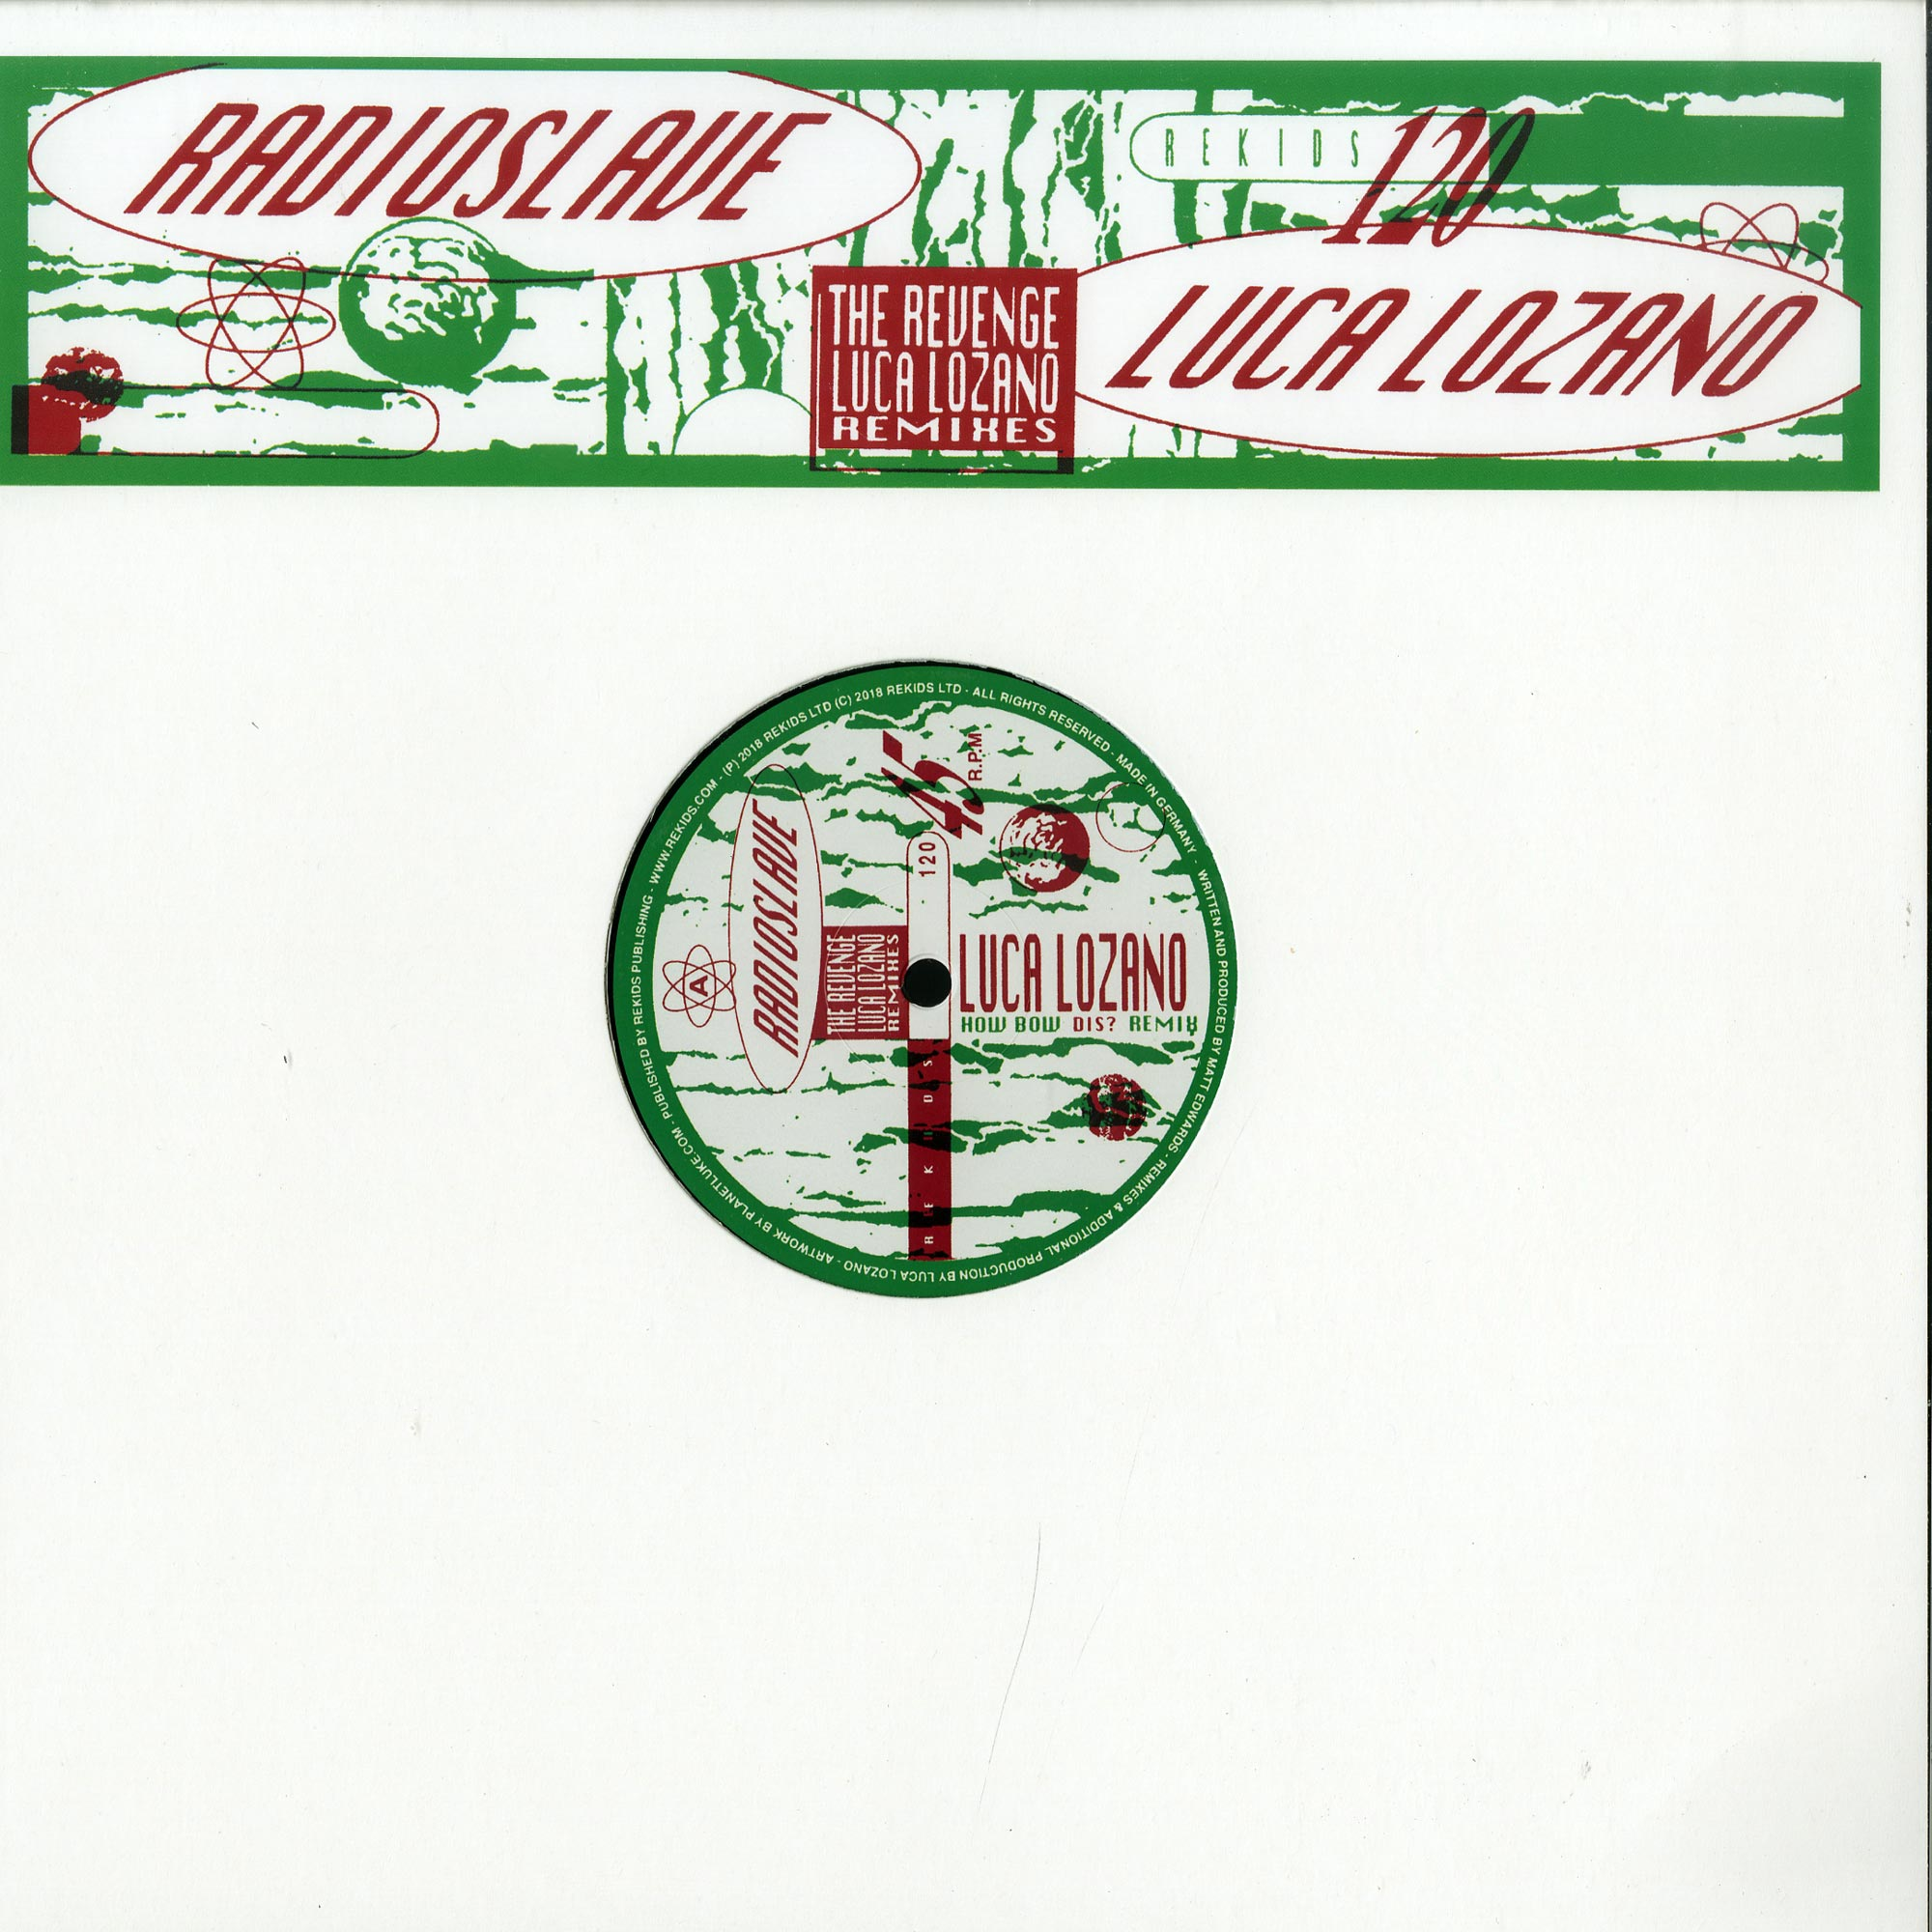 Radio Slave - THE REVENGE